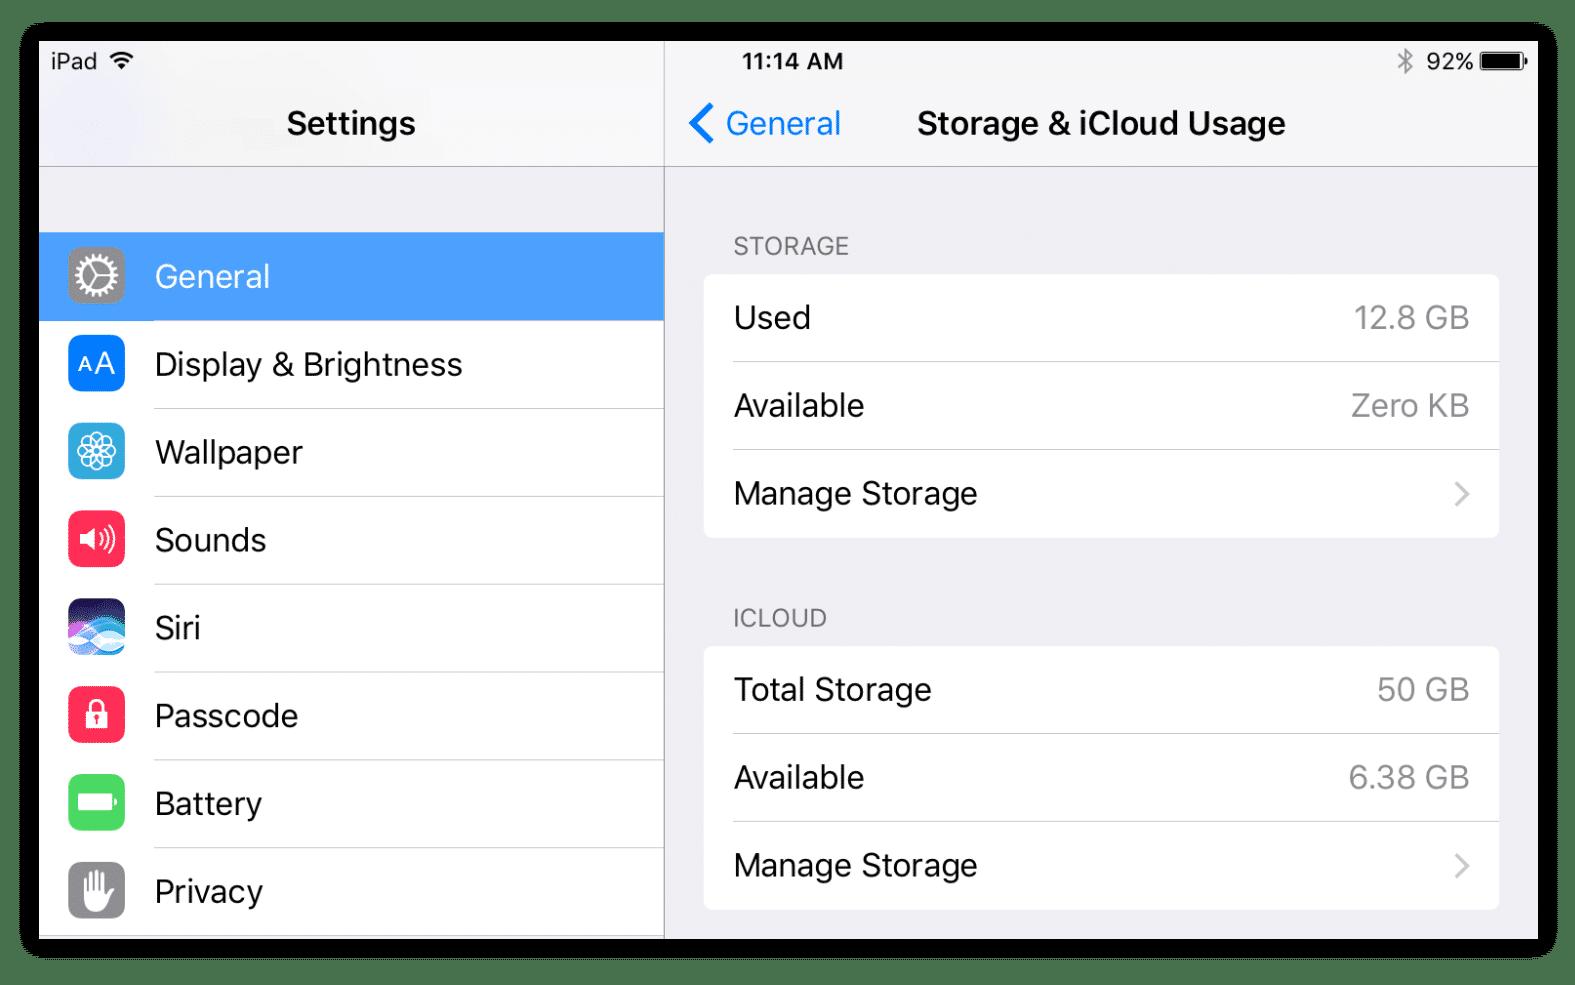 Storage and iCloud usage settings